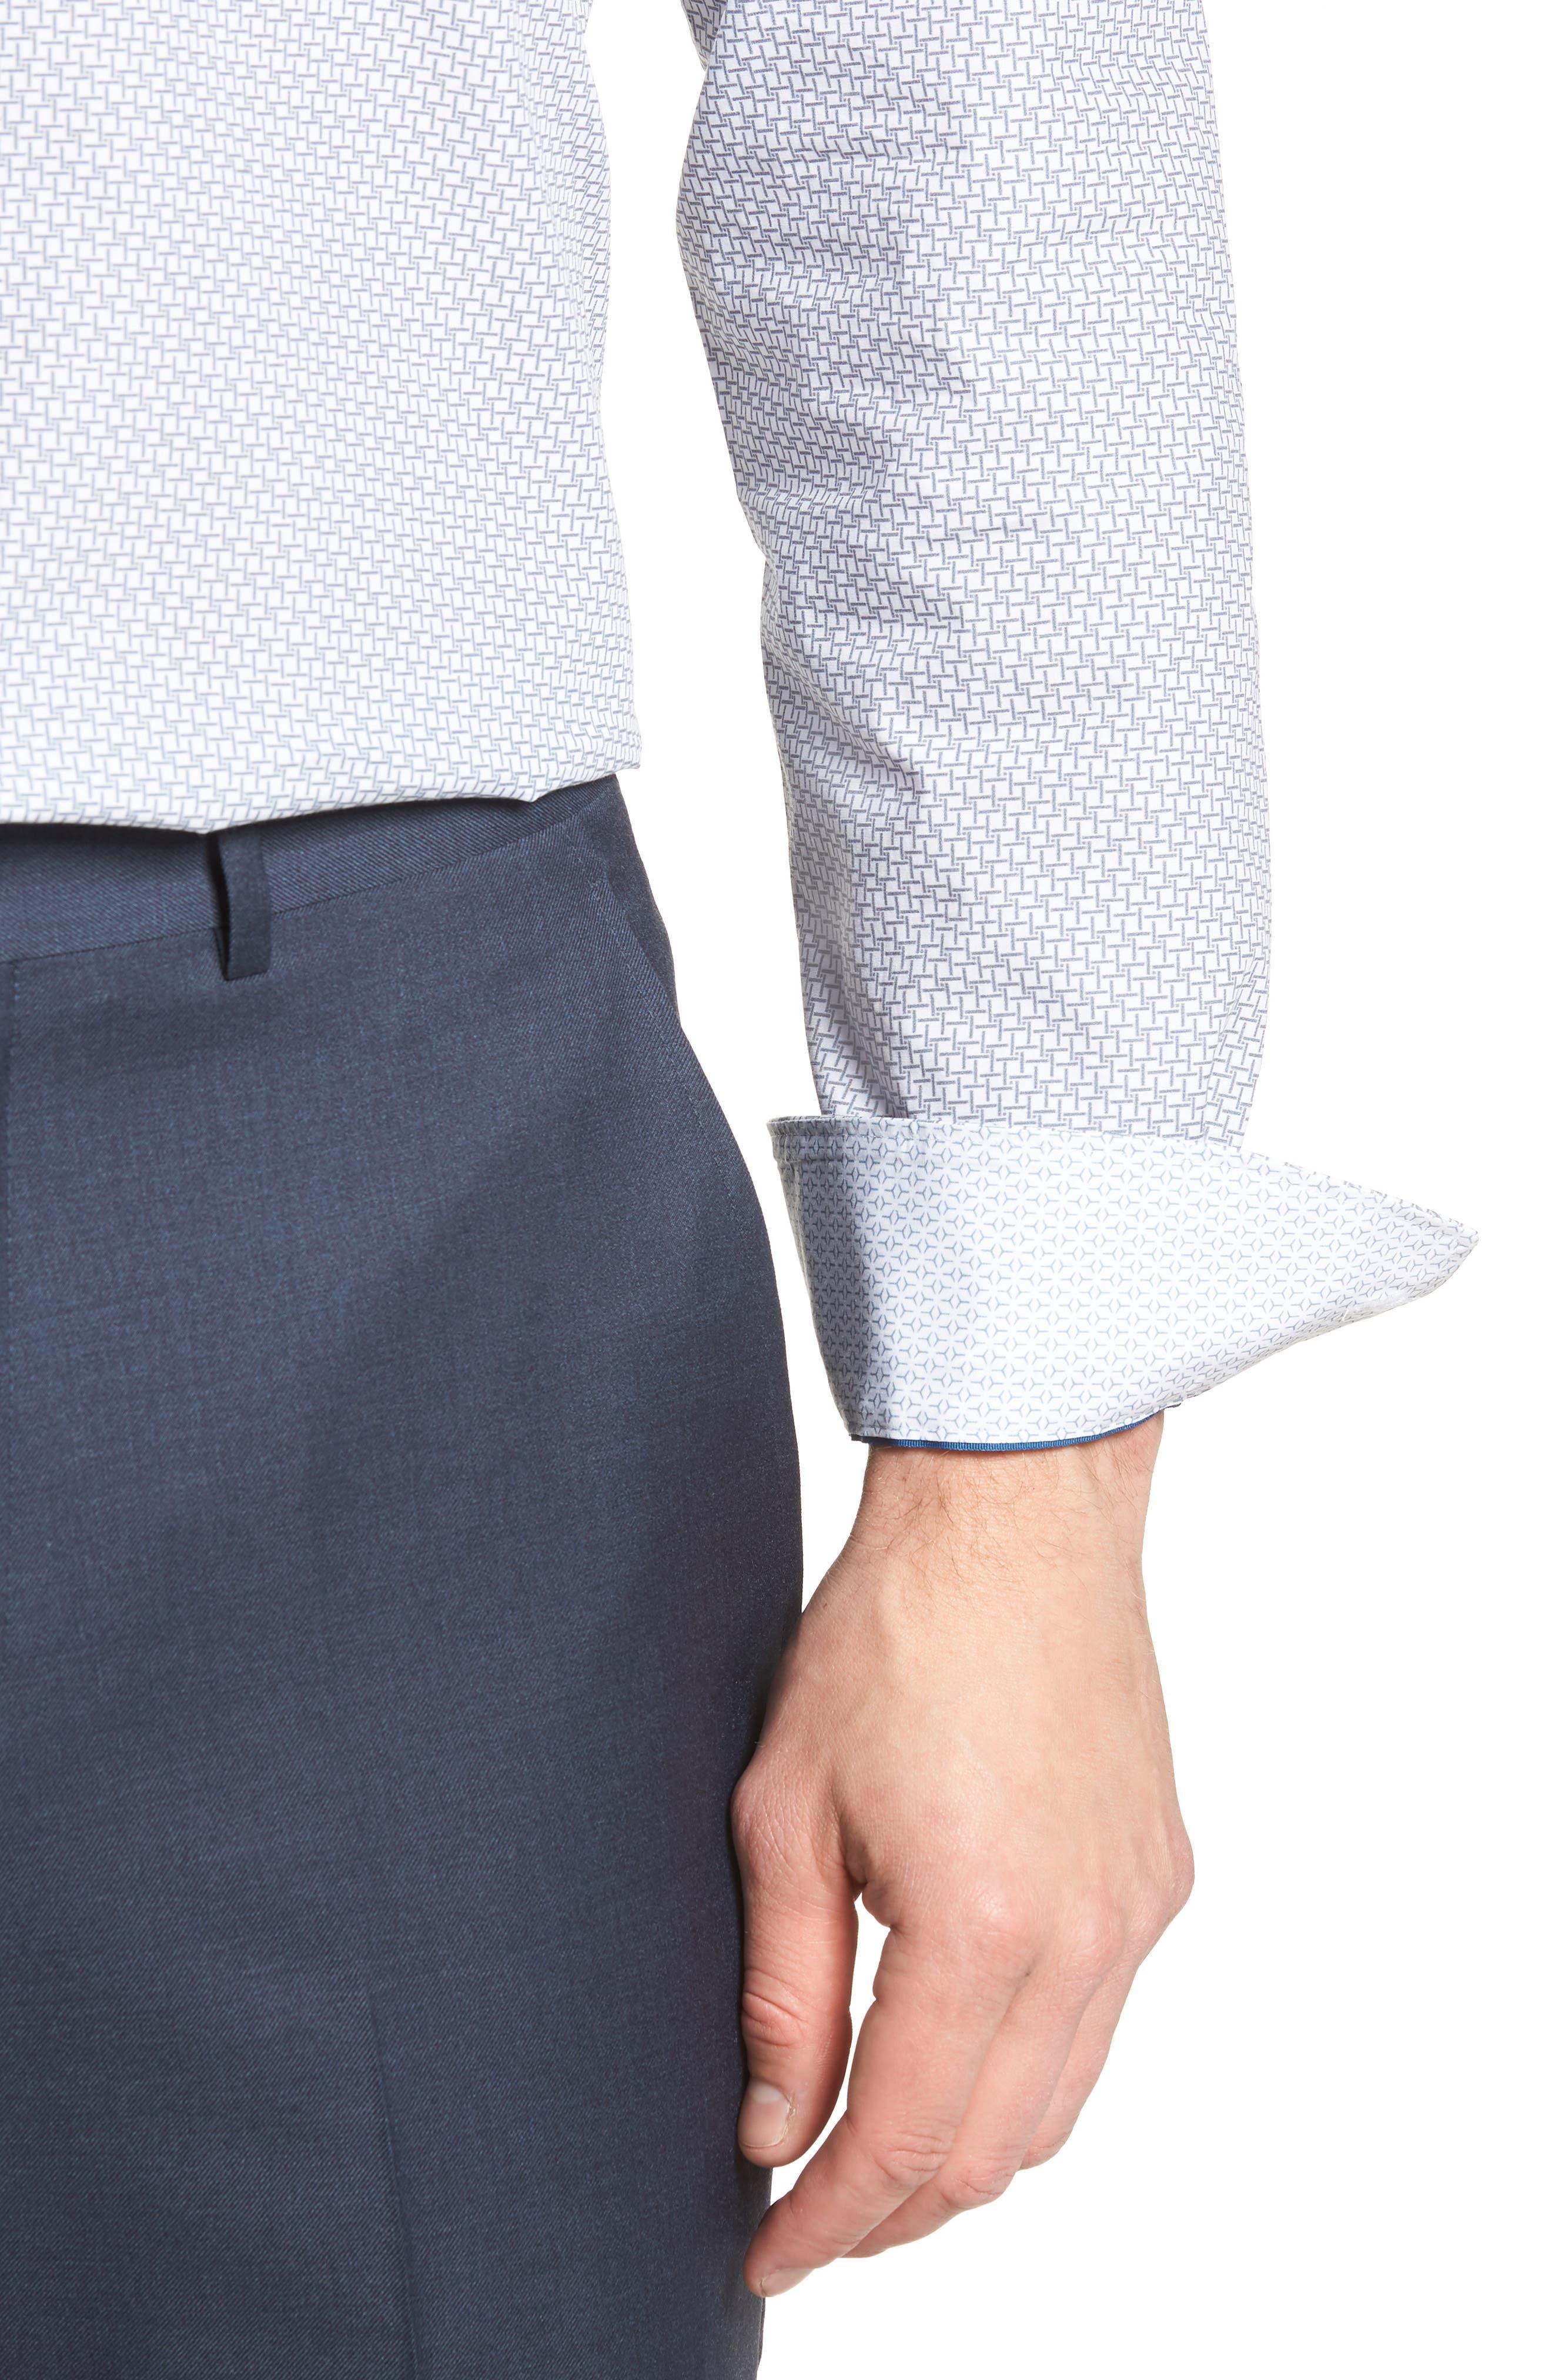 Rosprim Trim Fit Geometric Dress Shirt,                             Alternate thumbnail 2, color,                             GREY